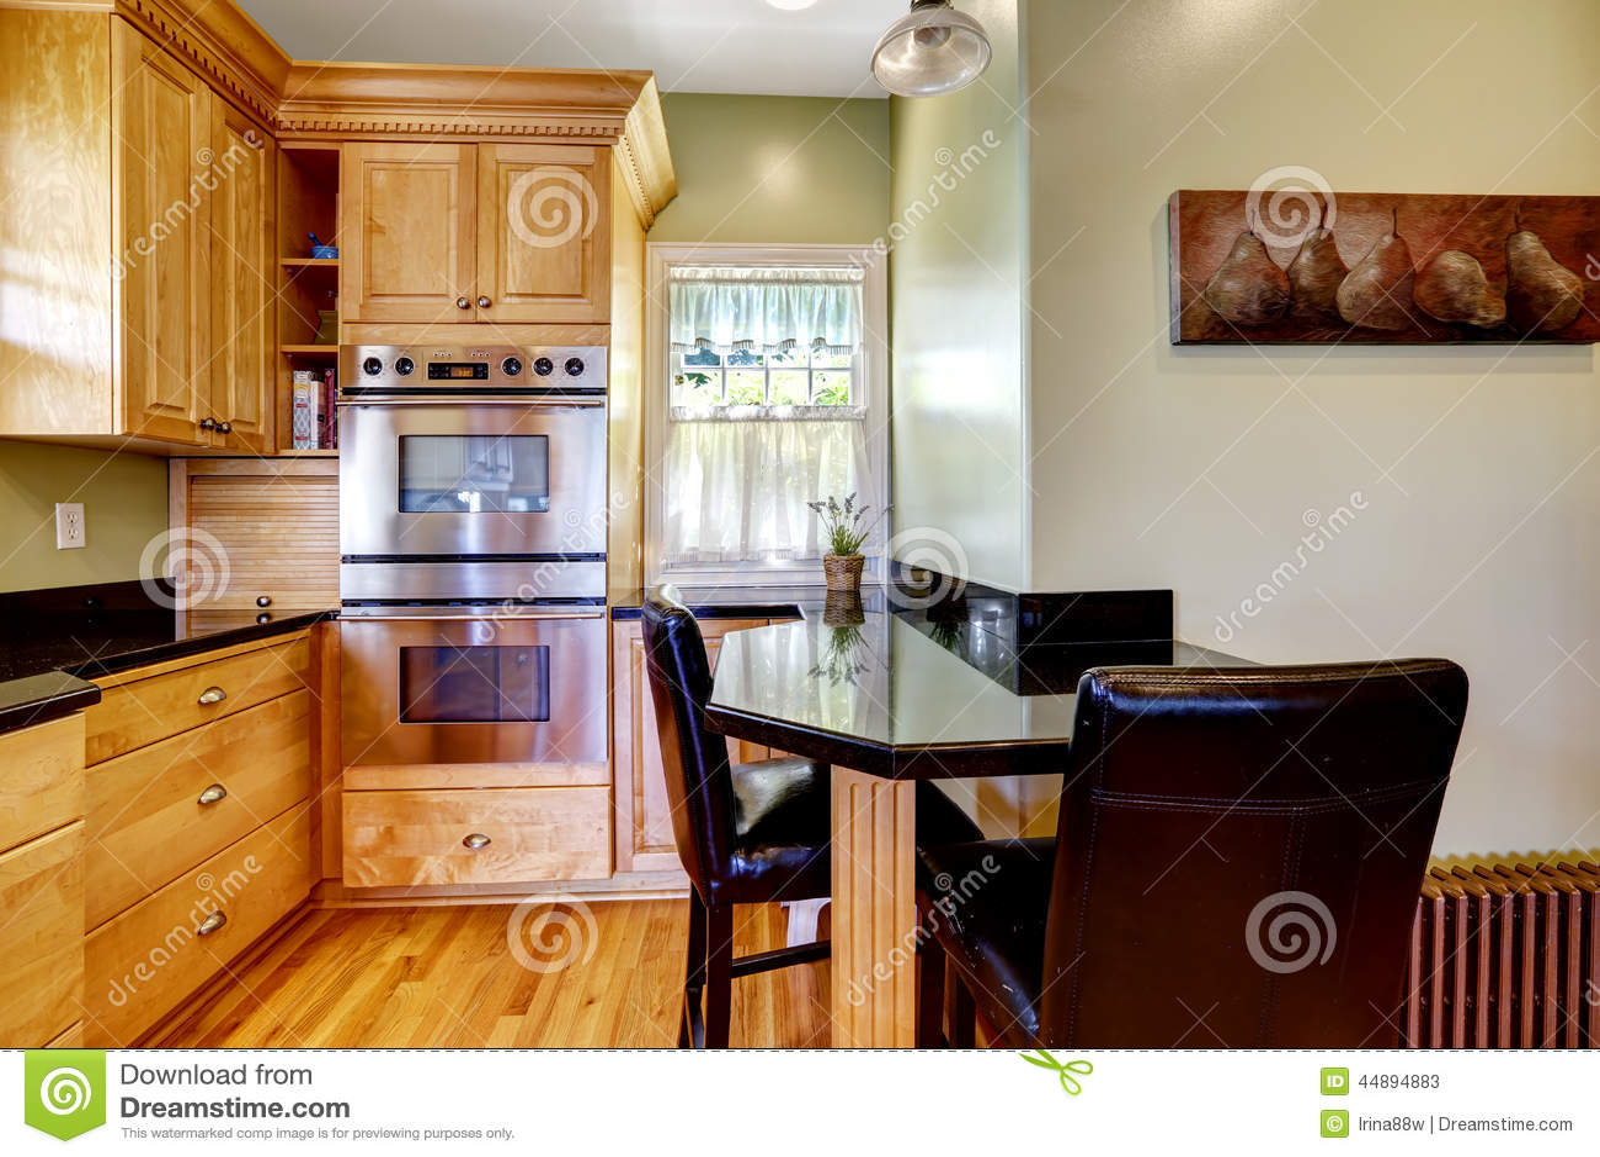 small kitchen table set pre cut granite countertops 光定调子有小餐桌和椅子的厨房室库存图片 图片包括有装备 木头 空间 光定调子有小餐桌和椅子的厨房室